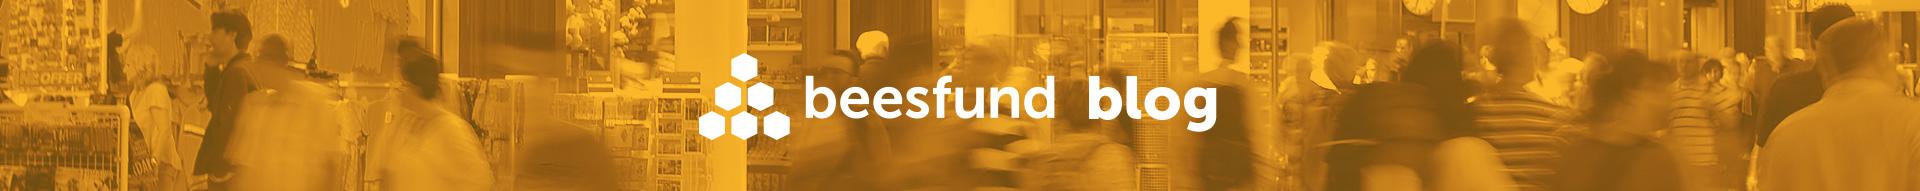 Beesfund Blog logo